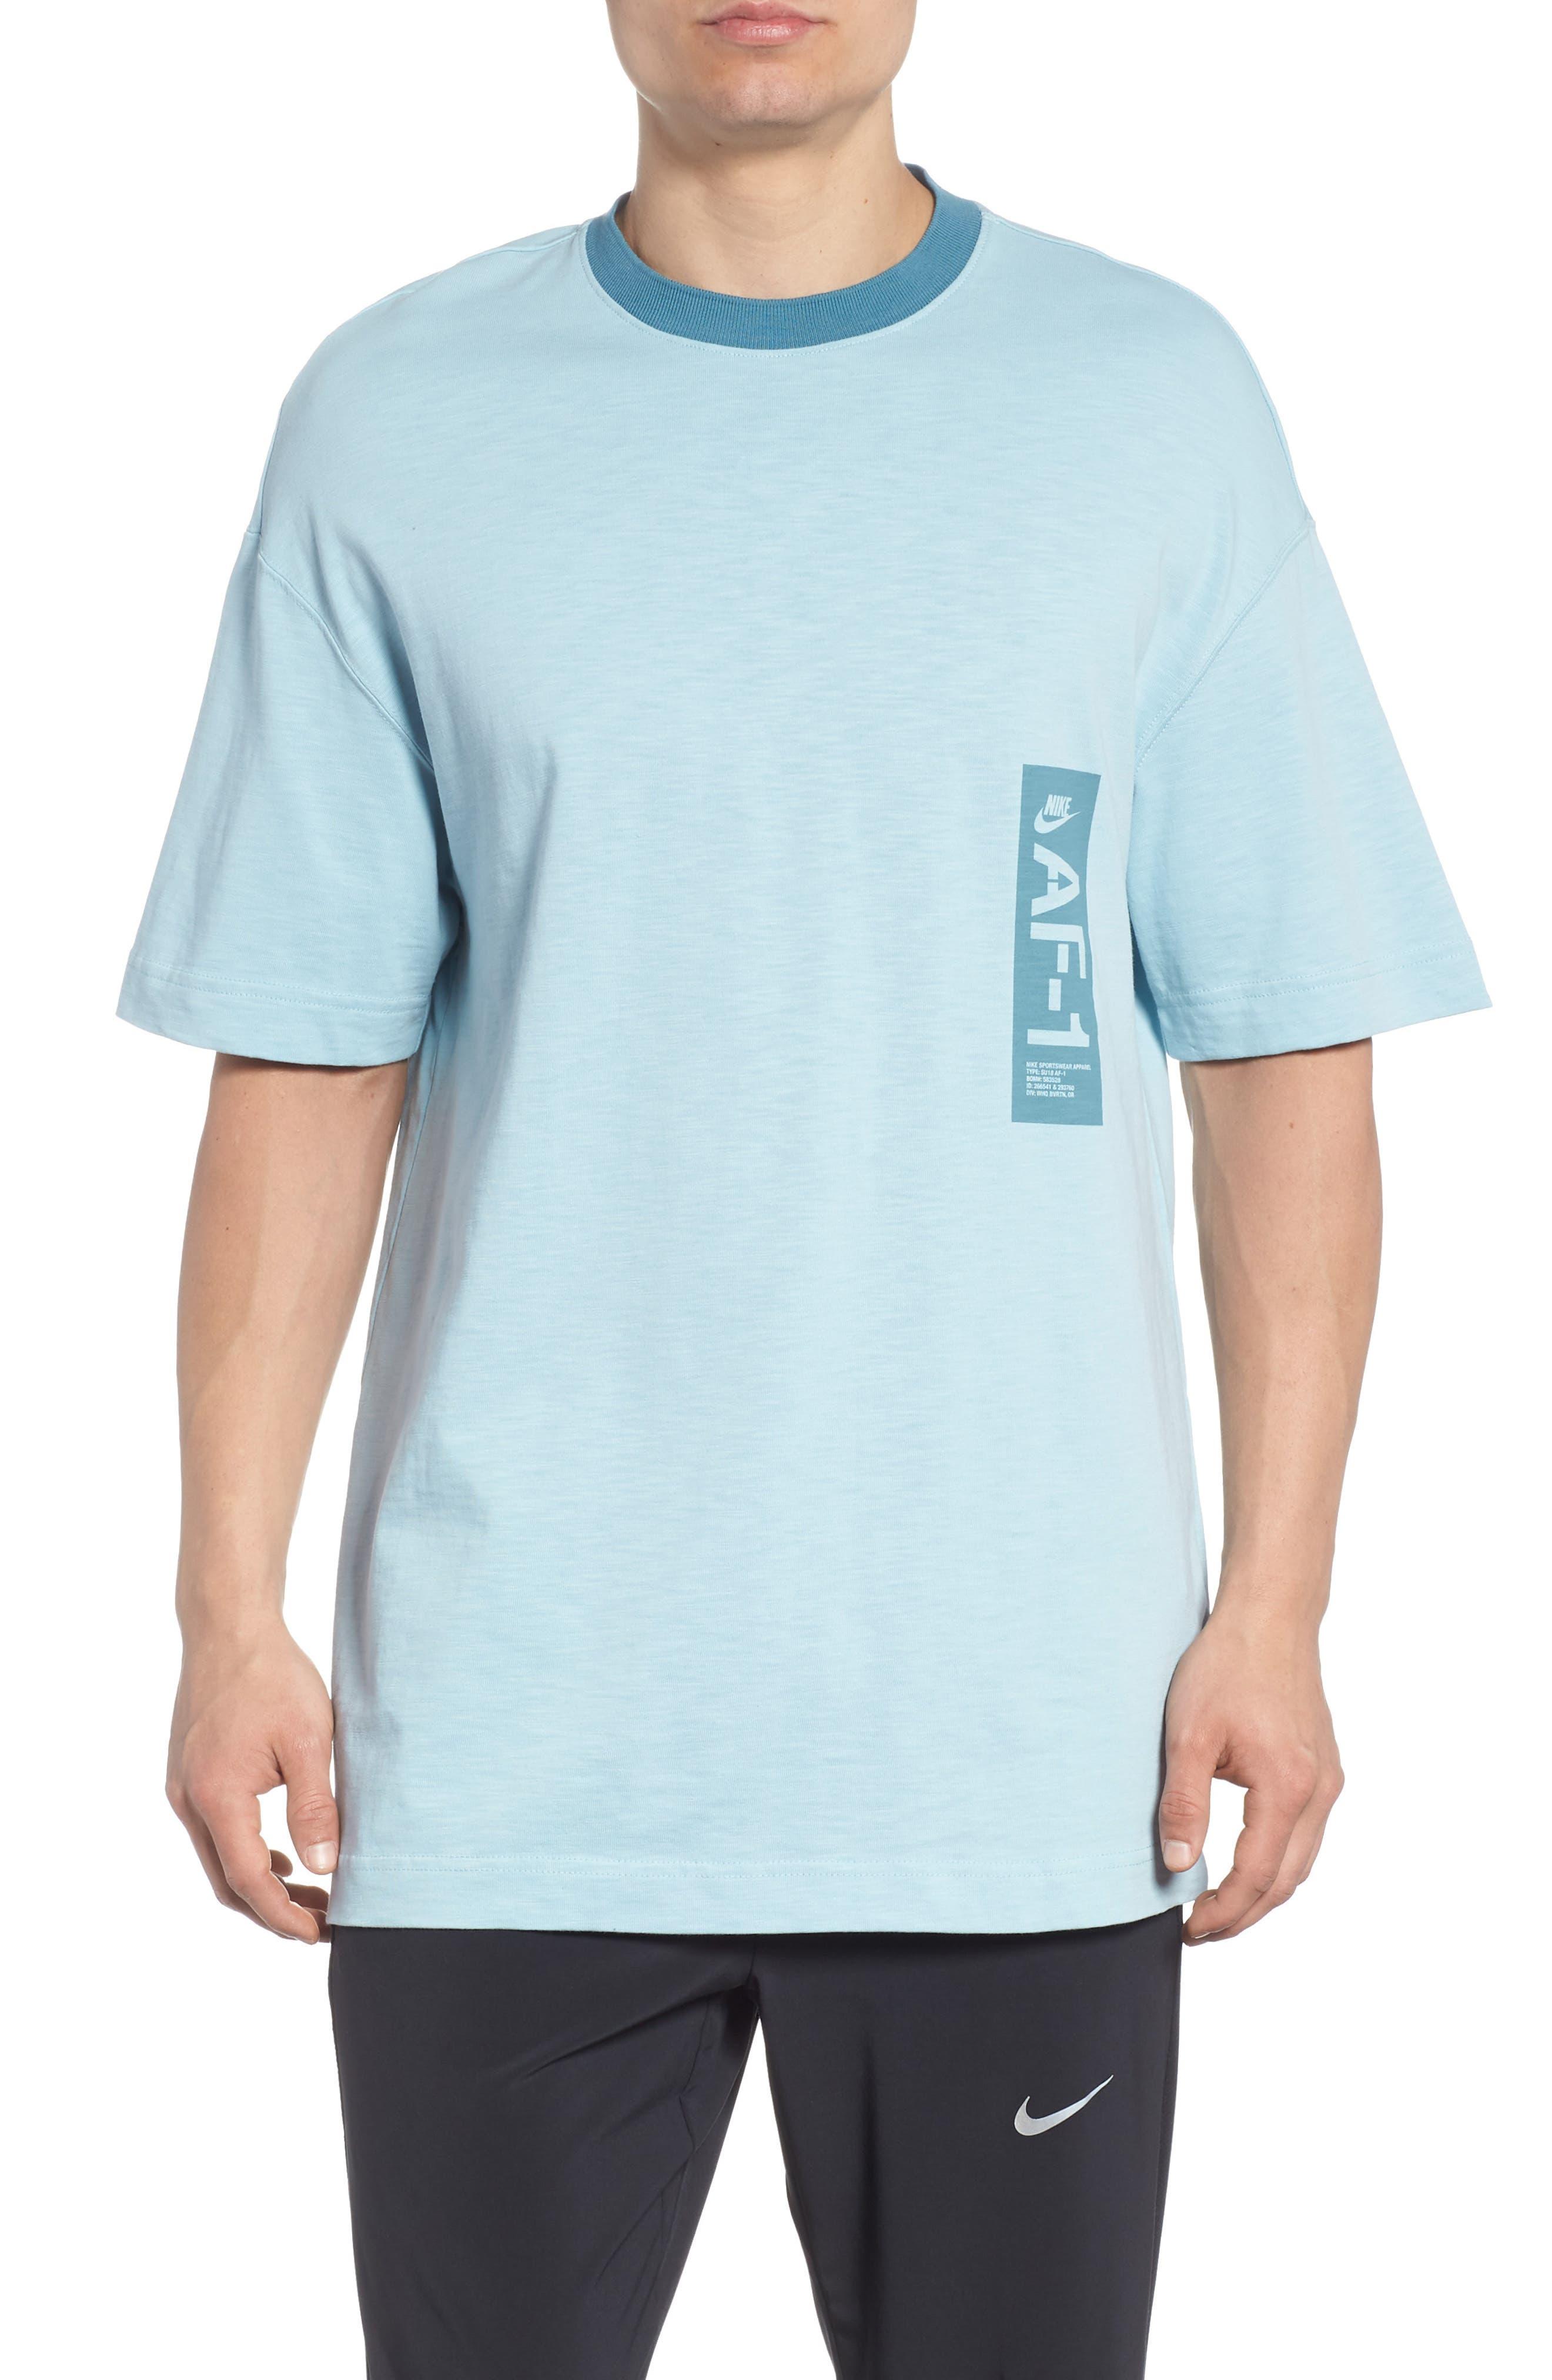 Sportswear AF1 Graphic T-Shirt,                         Main,                         color, Ocean Bliss/ Noise Aqua